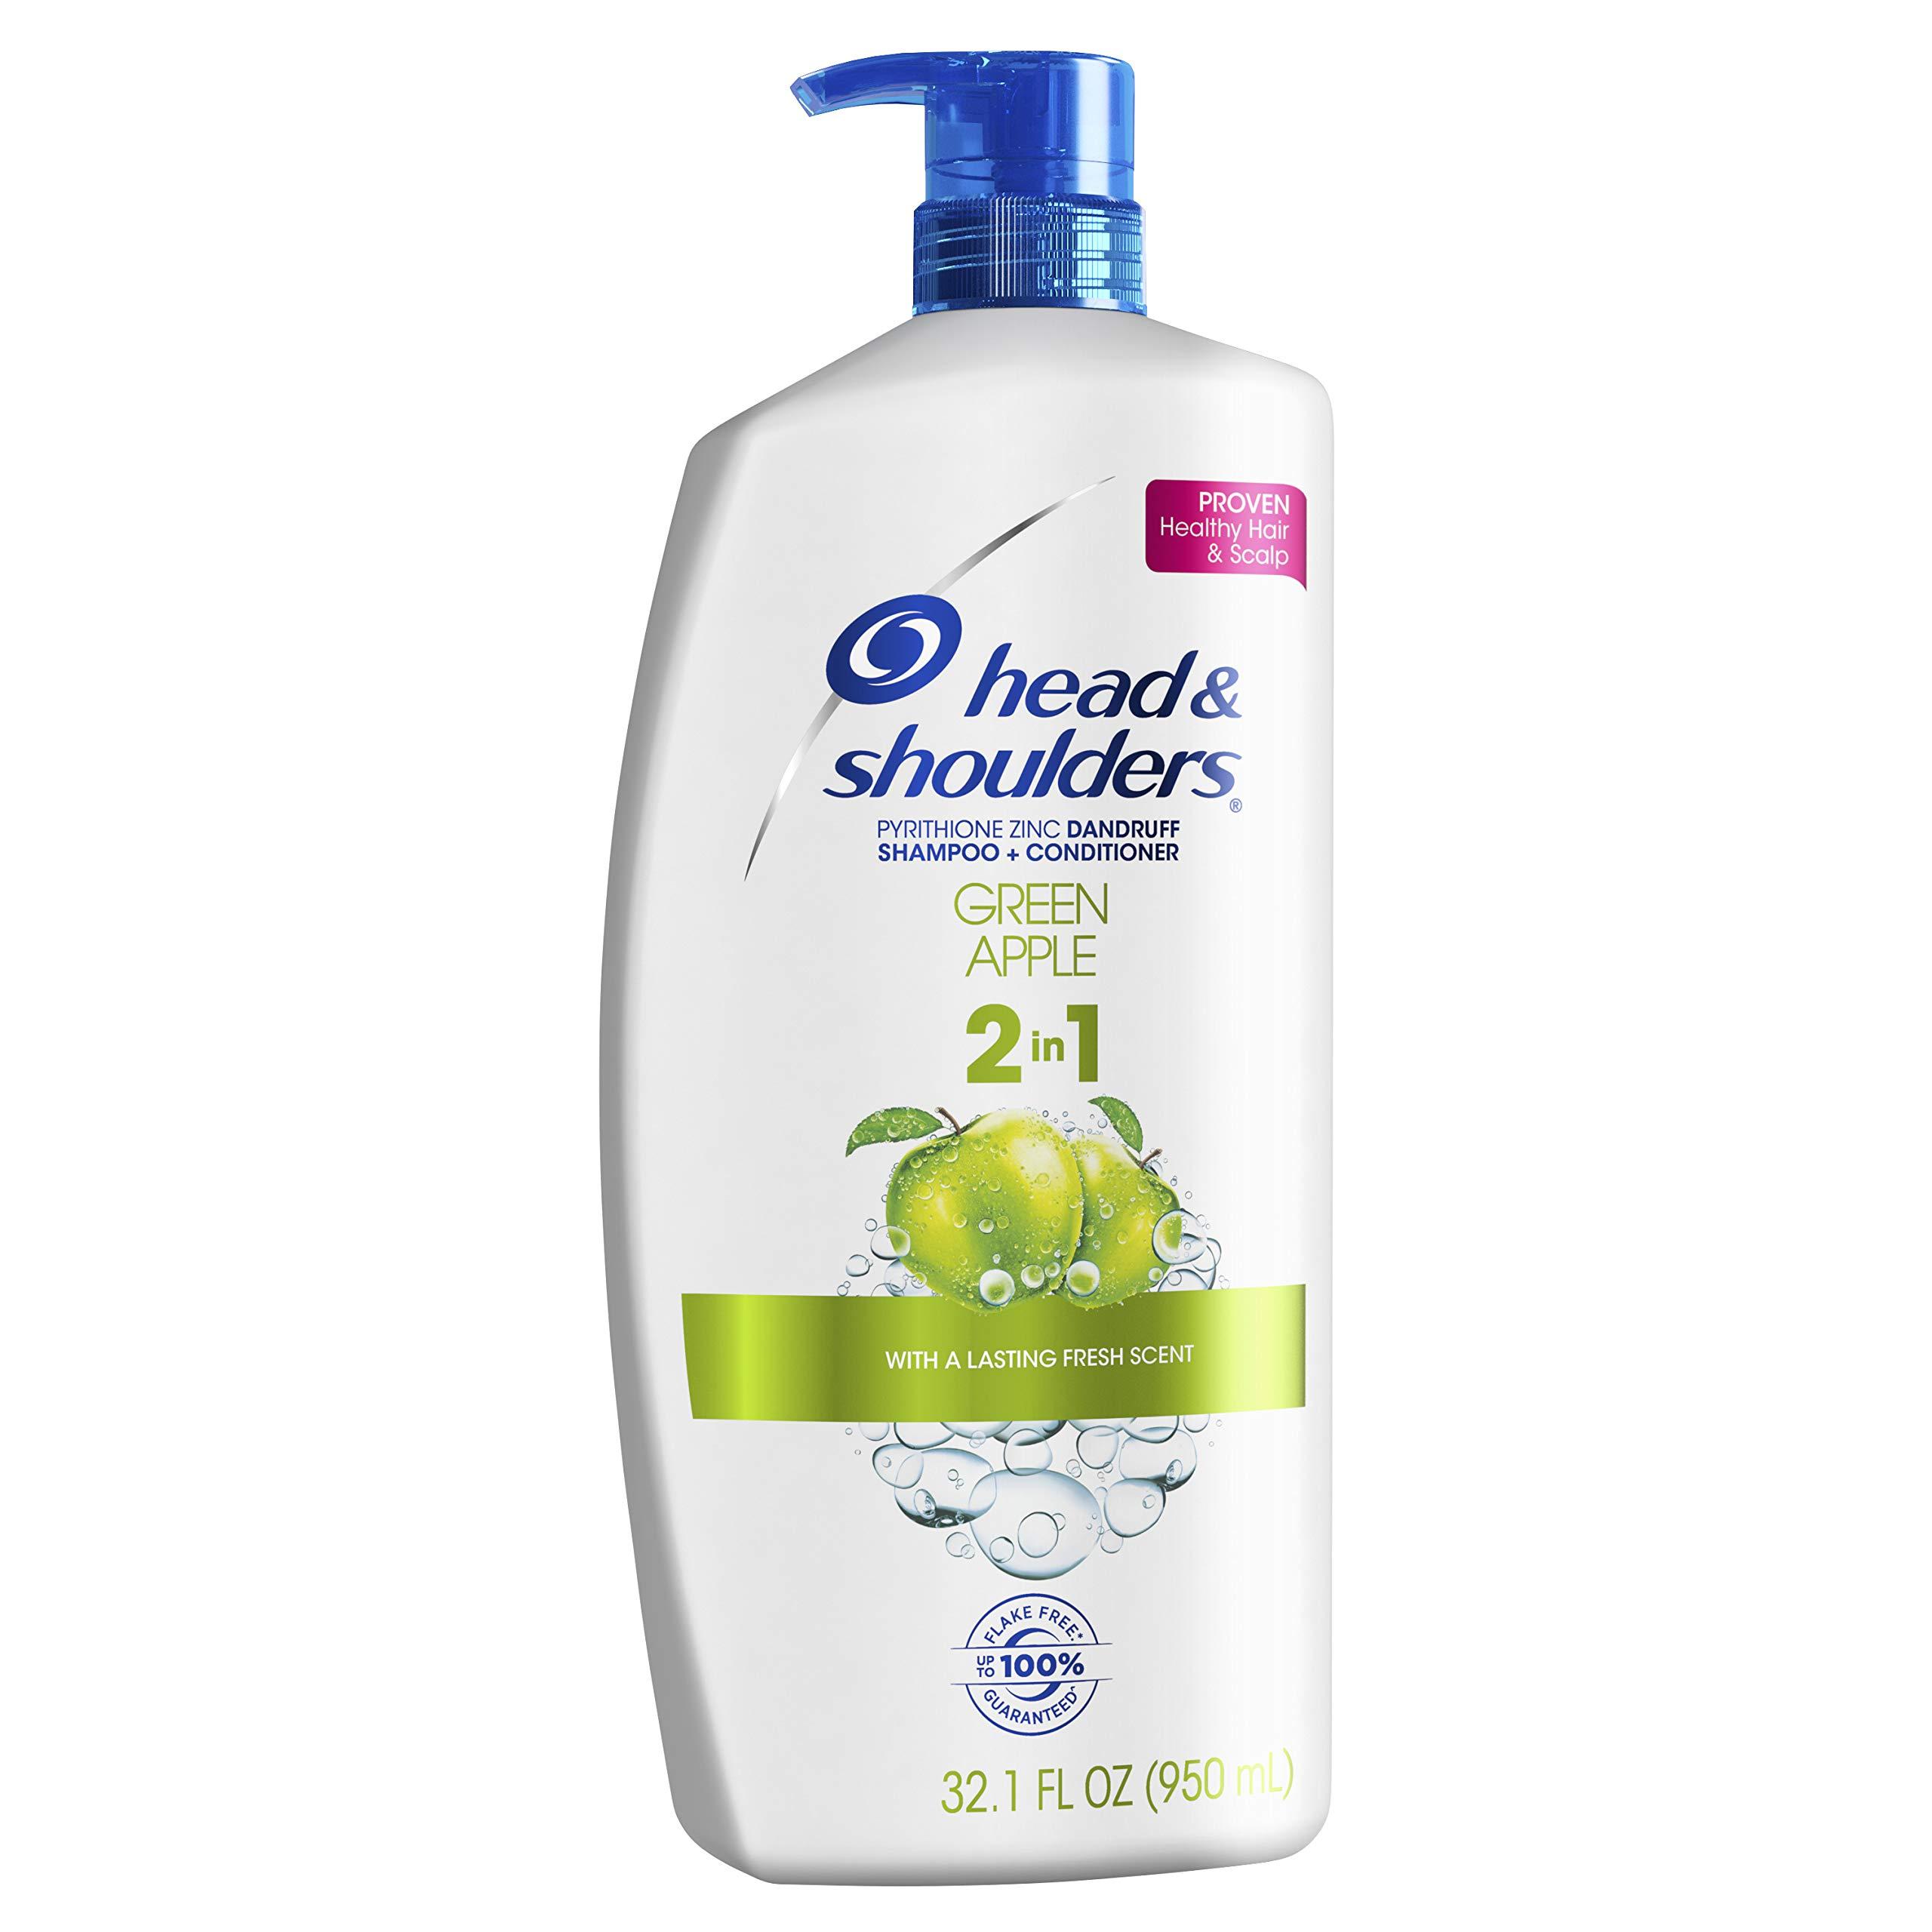 Head and Shoulders Green Apple 2-in-1 Anti-Dandruff Shampoo + Conditioner 32.1 Fl Oz